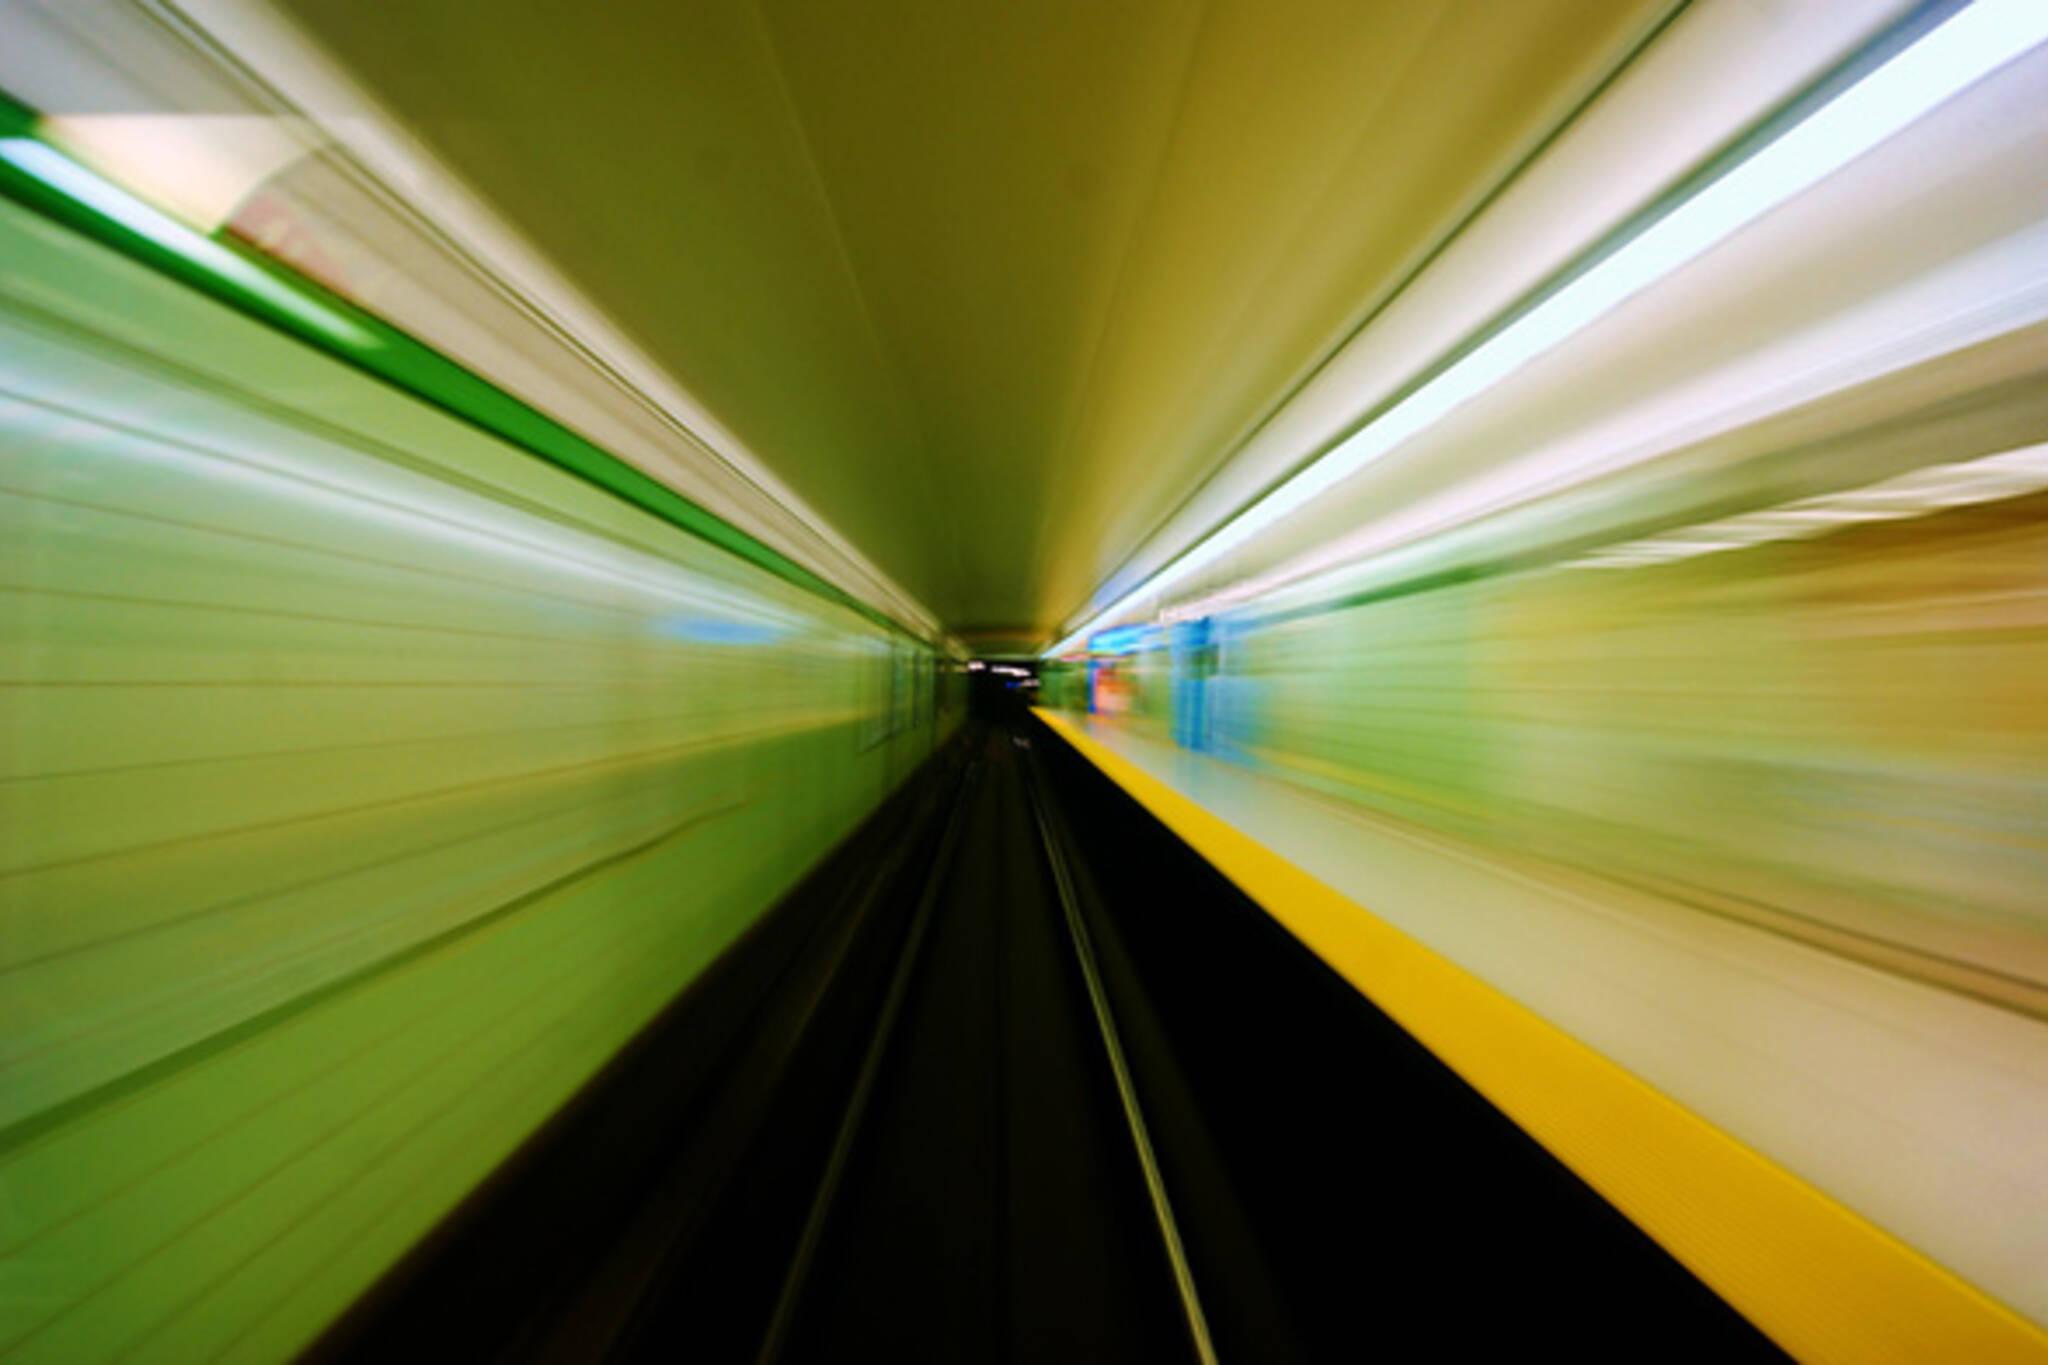 St George Subway